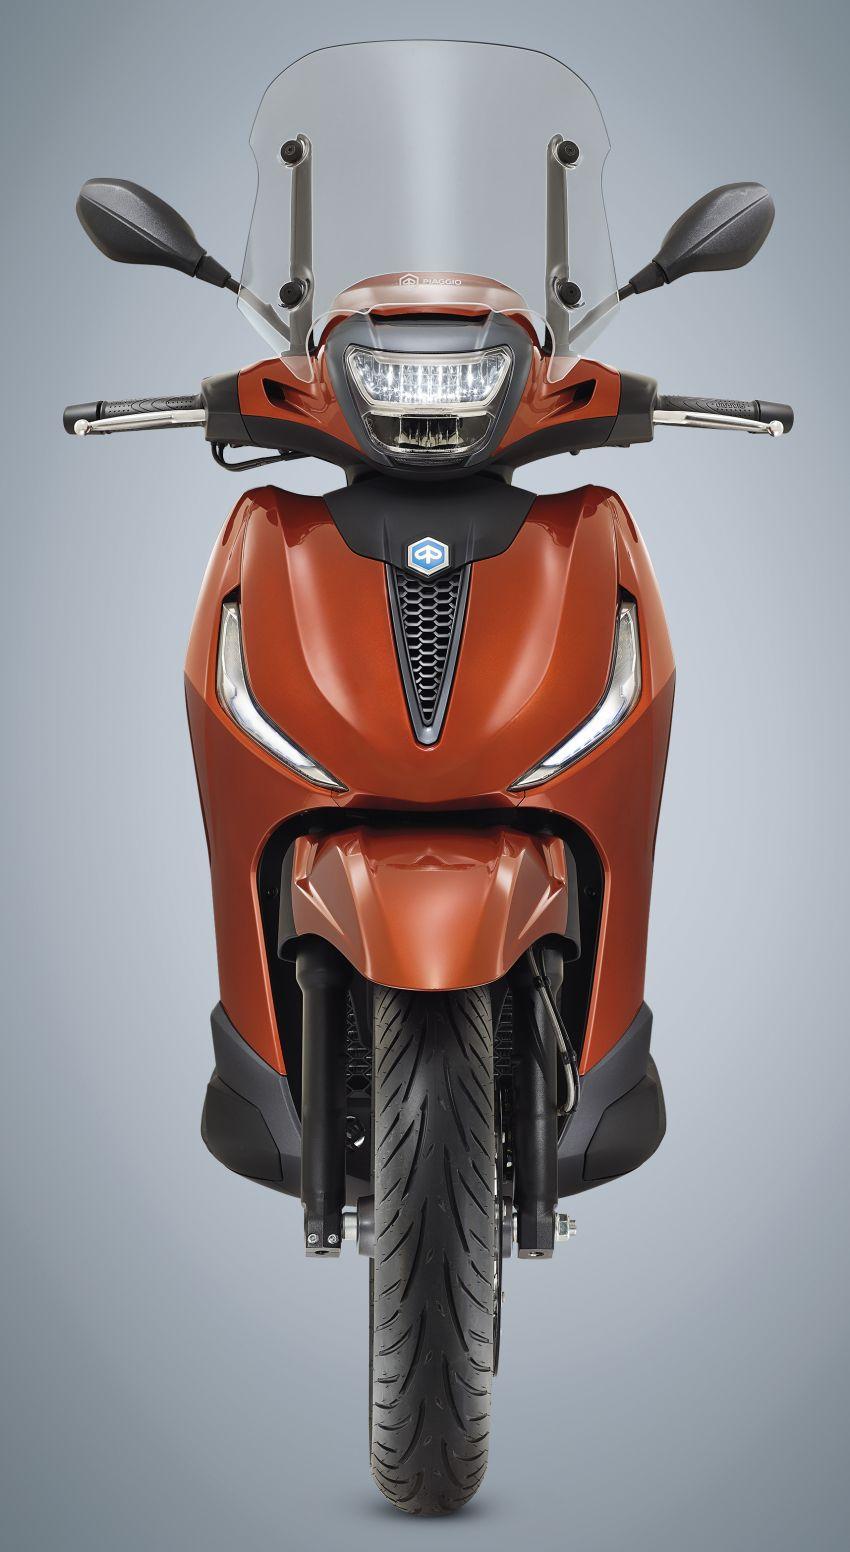 2021 Piaggio Beverly – suburban scooter elegance Image #1228888